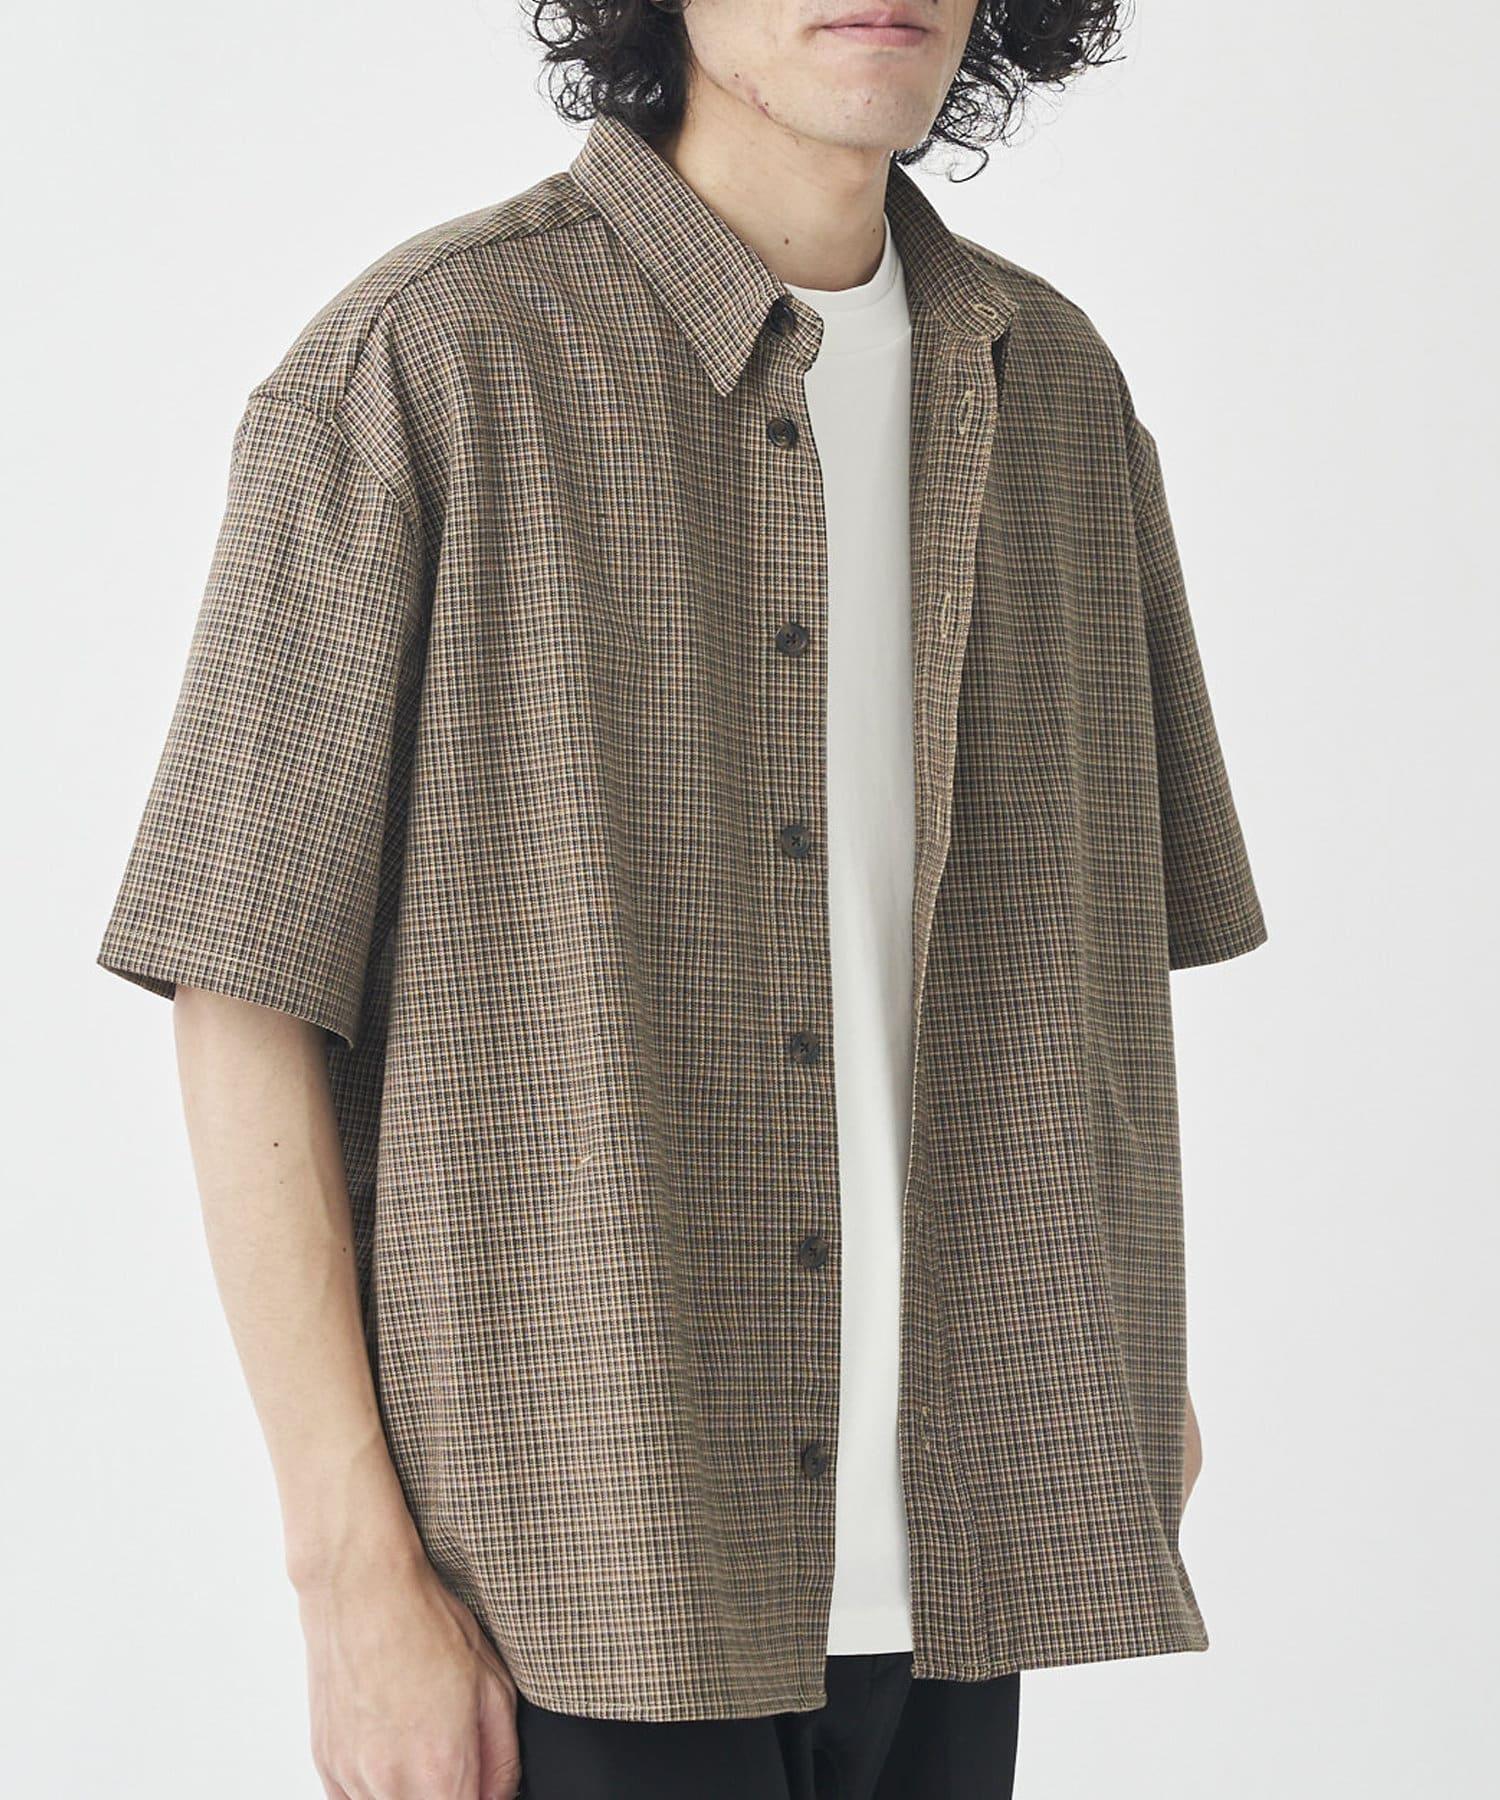 CPCM(シーピーシーエム) TRチェック半袖ビッグシャツ